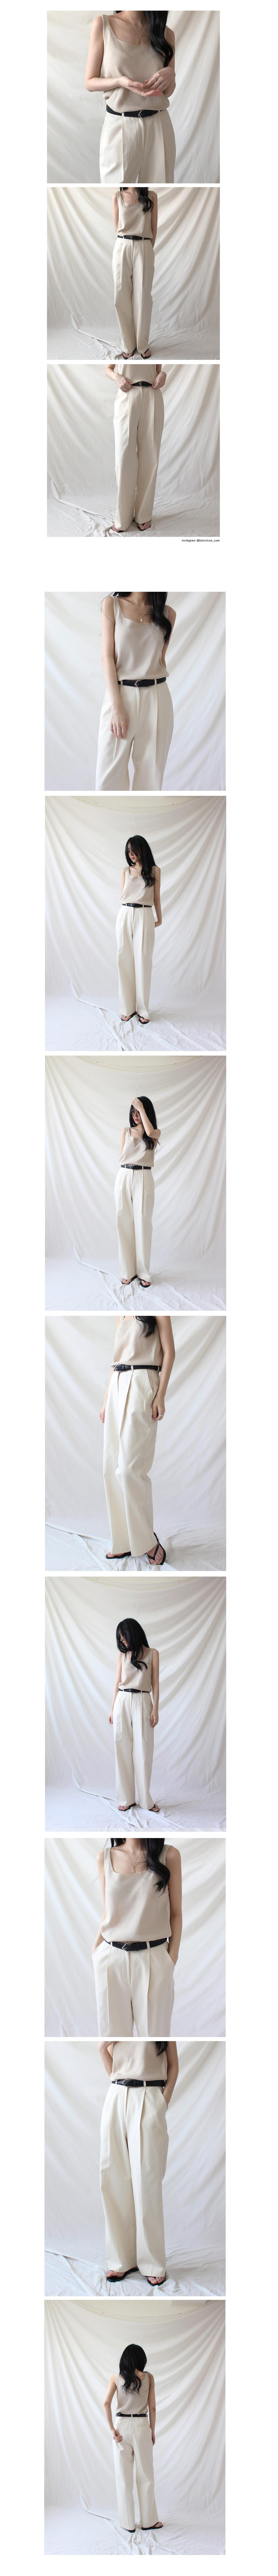 Pintuck straight pants * Add color